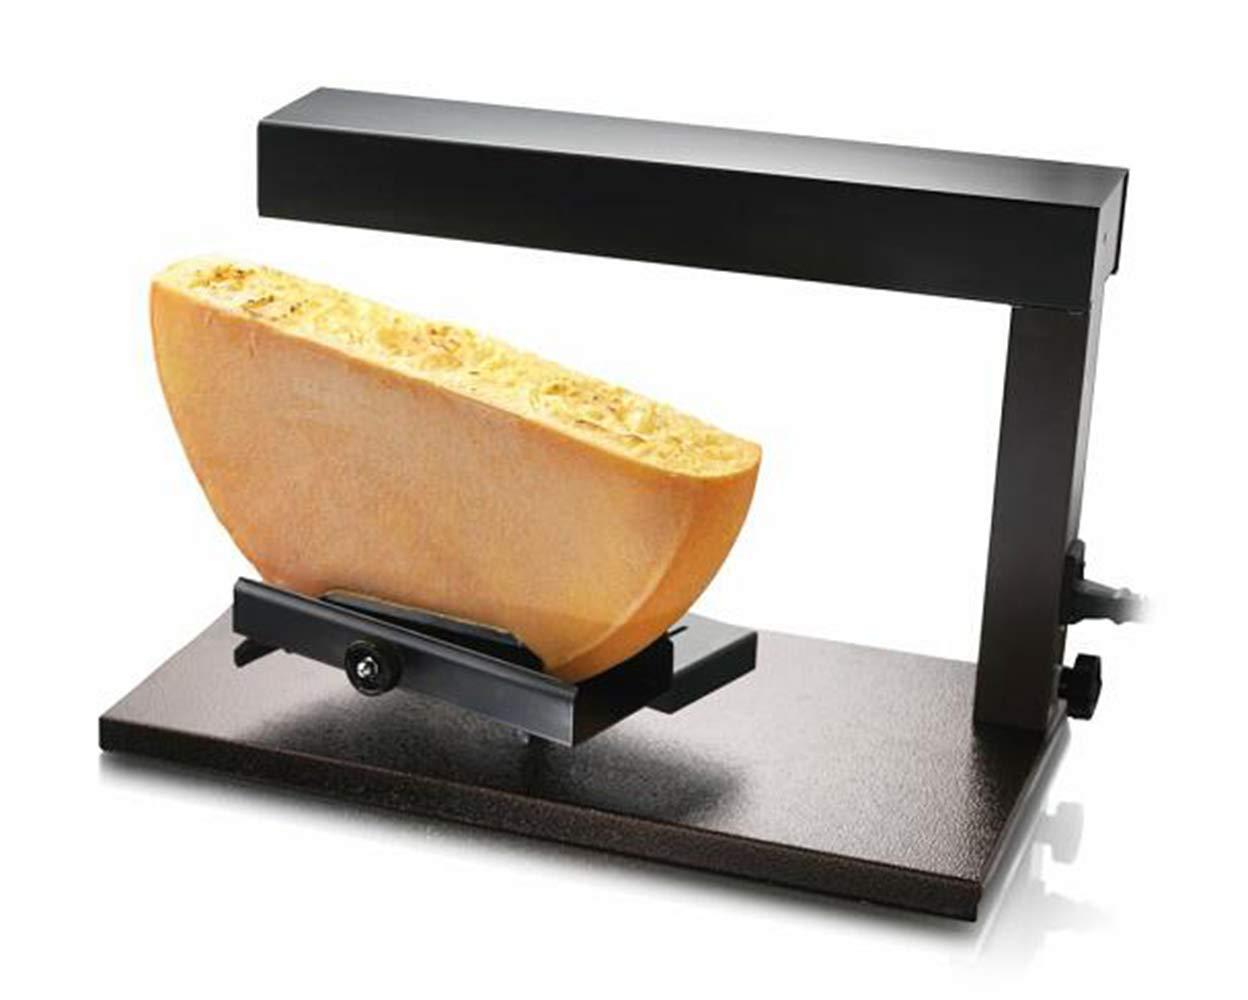 Zz Pro Commercial Cheese Melter Popular Swiss Dish Maker Raclette Demi Melting Machine 650 Watt Quick heating Anti-rusting